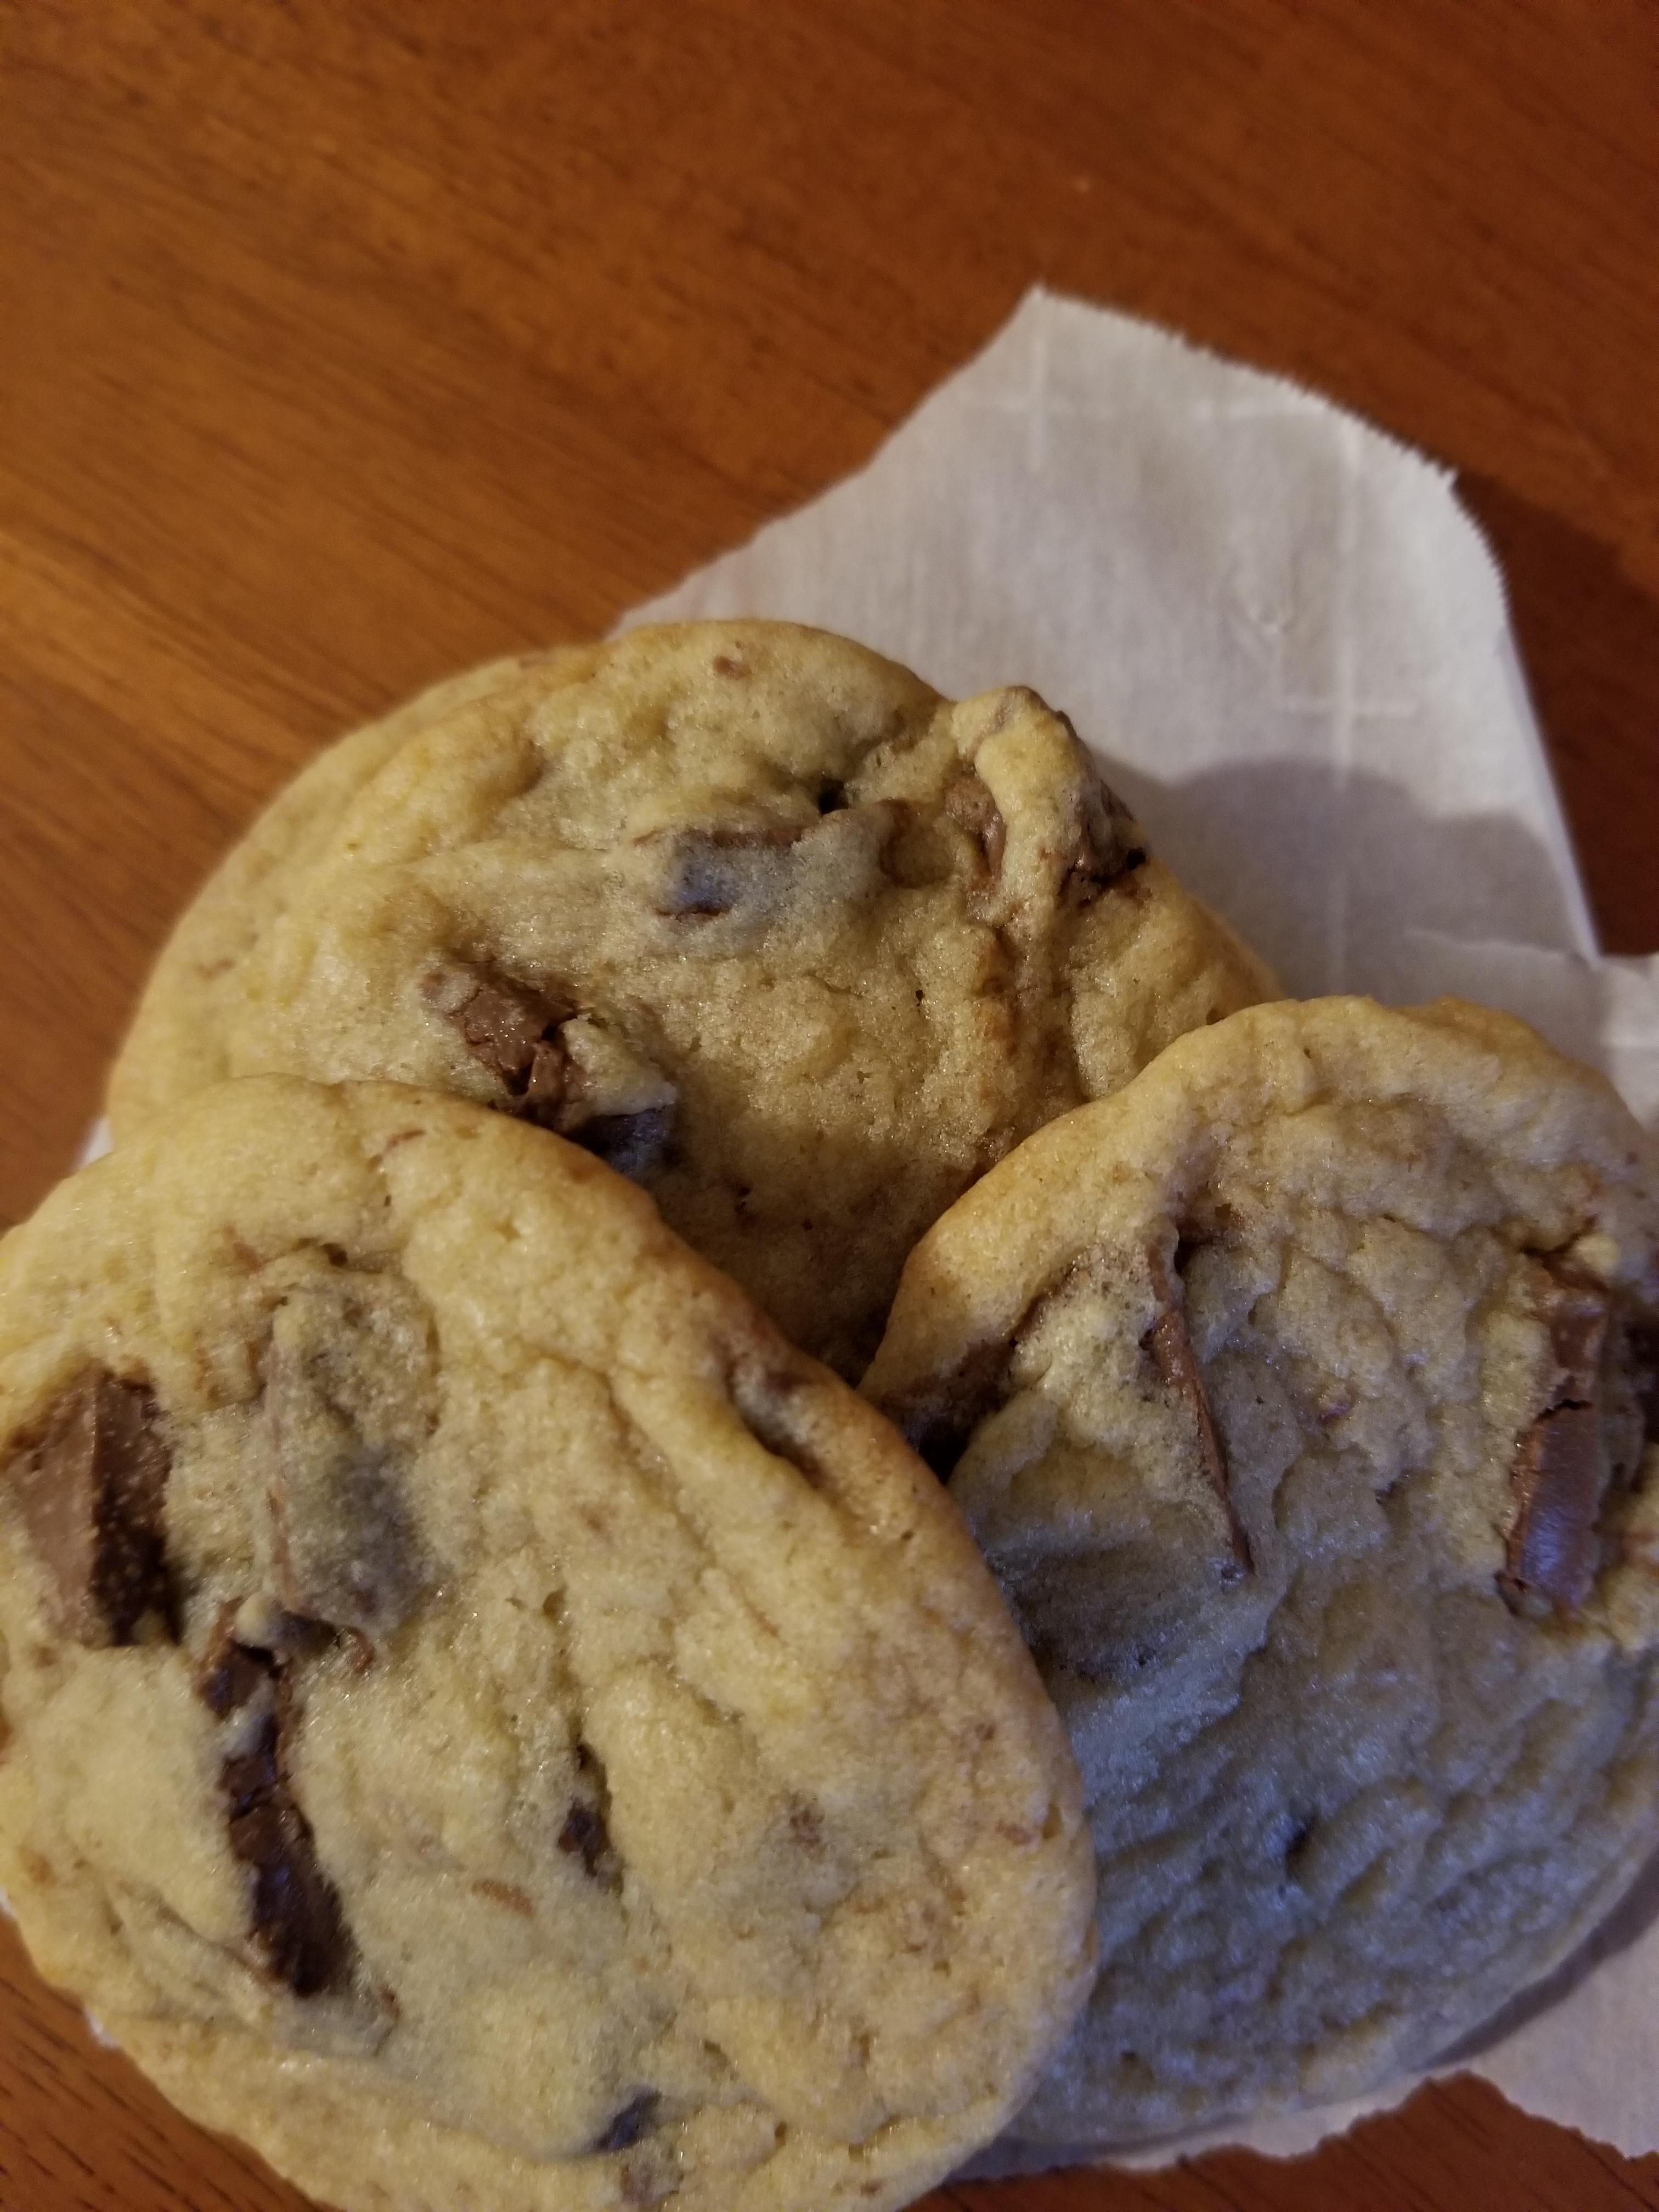 A pile of Hershey Chunk Cookies